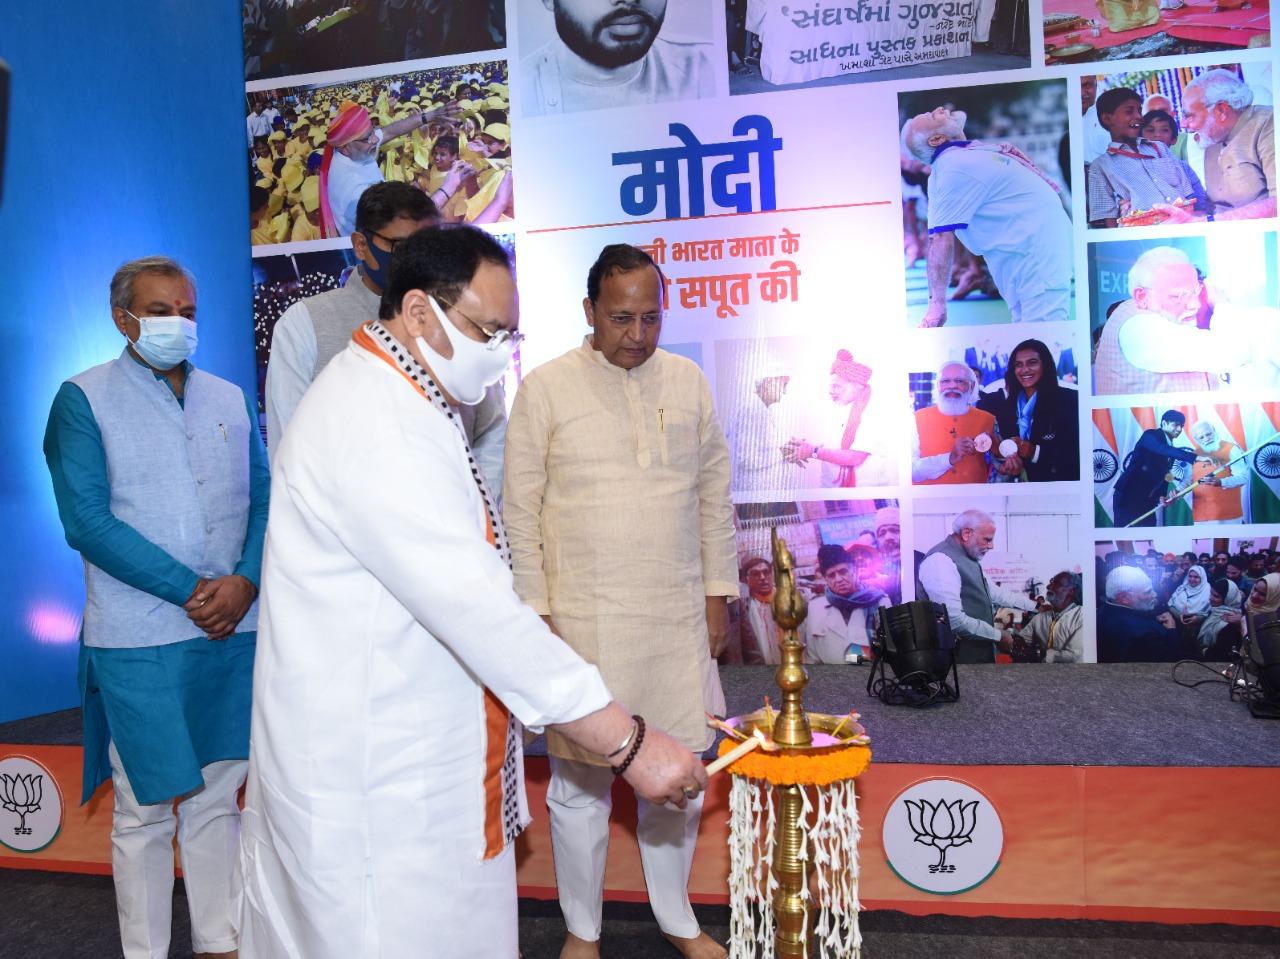 BJP organises several programmes to mark 71th birthday of PM Modi